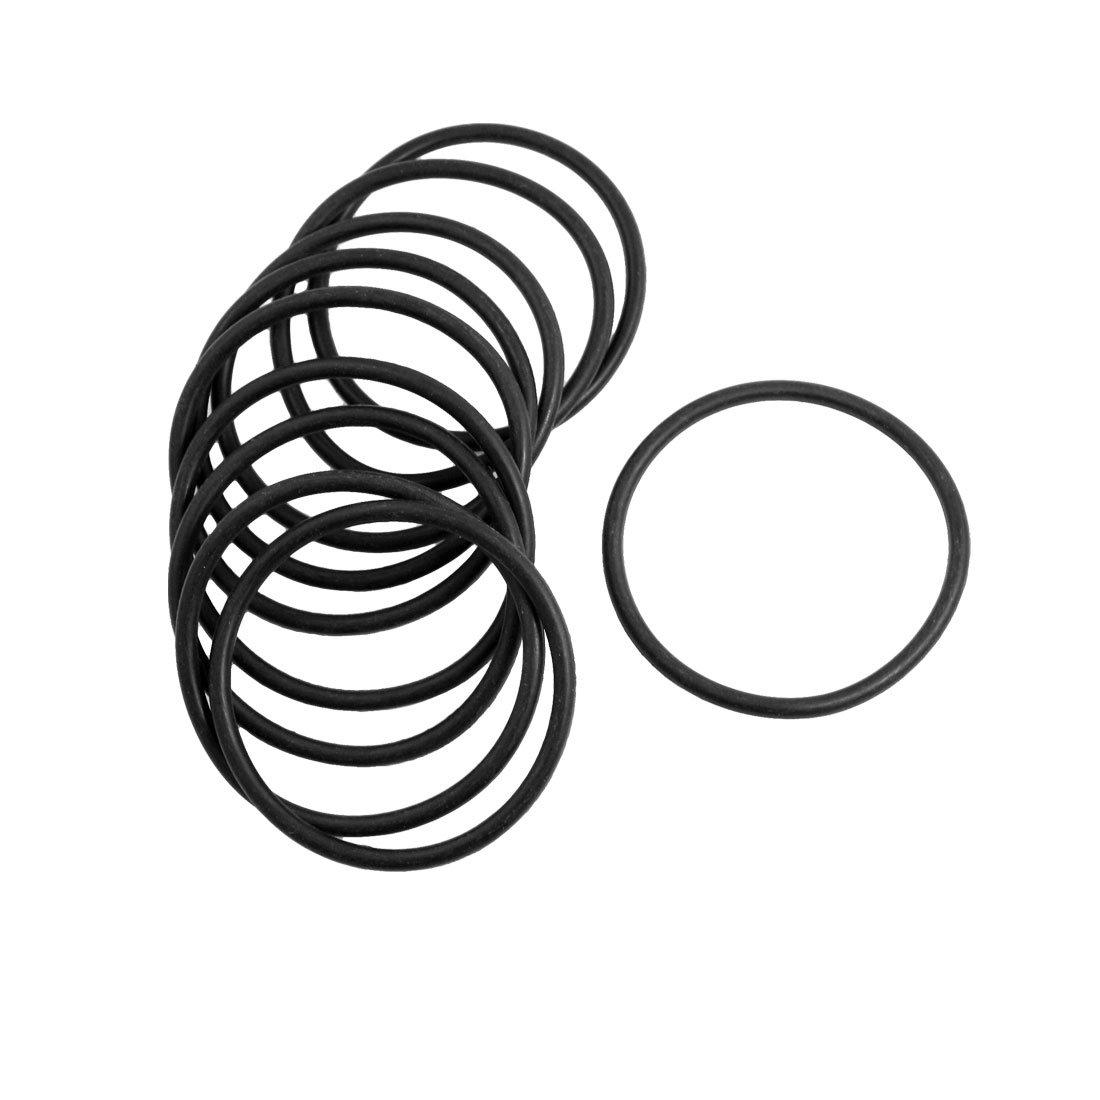 10 Pcs 3mm x 52mm Rubber Sealing Oil Filter O Rings Gasket Black